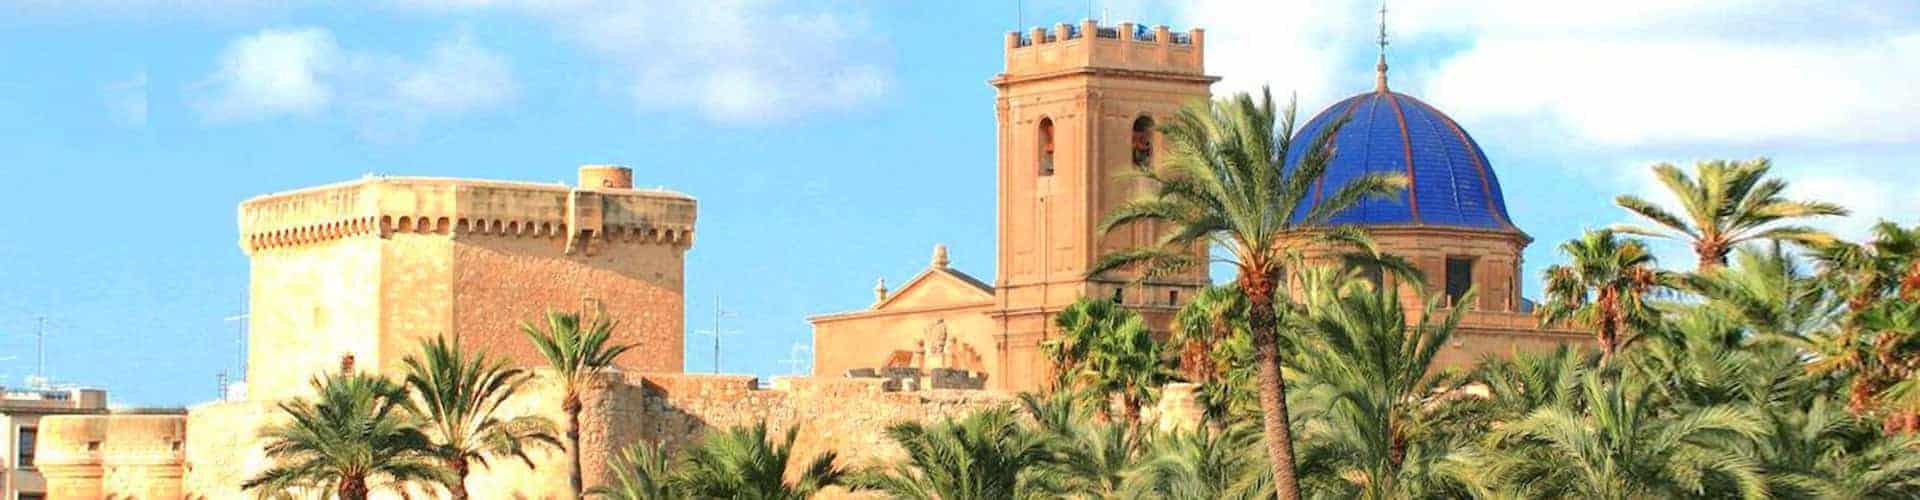 Free Tour Elche - Turismo de España